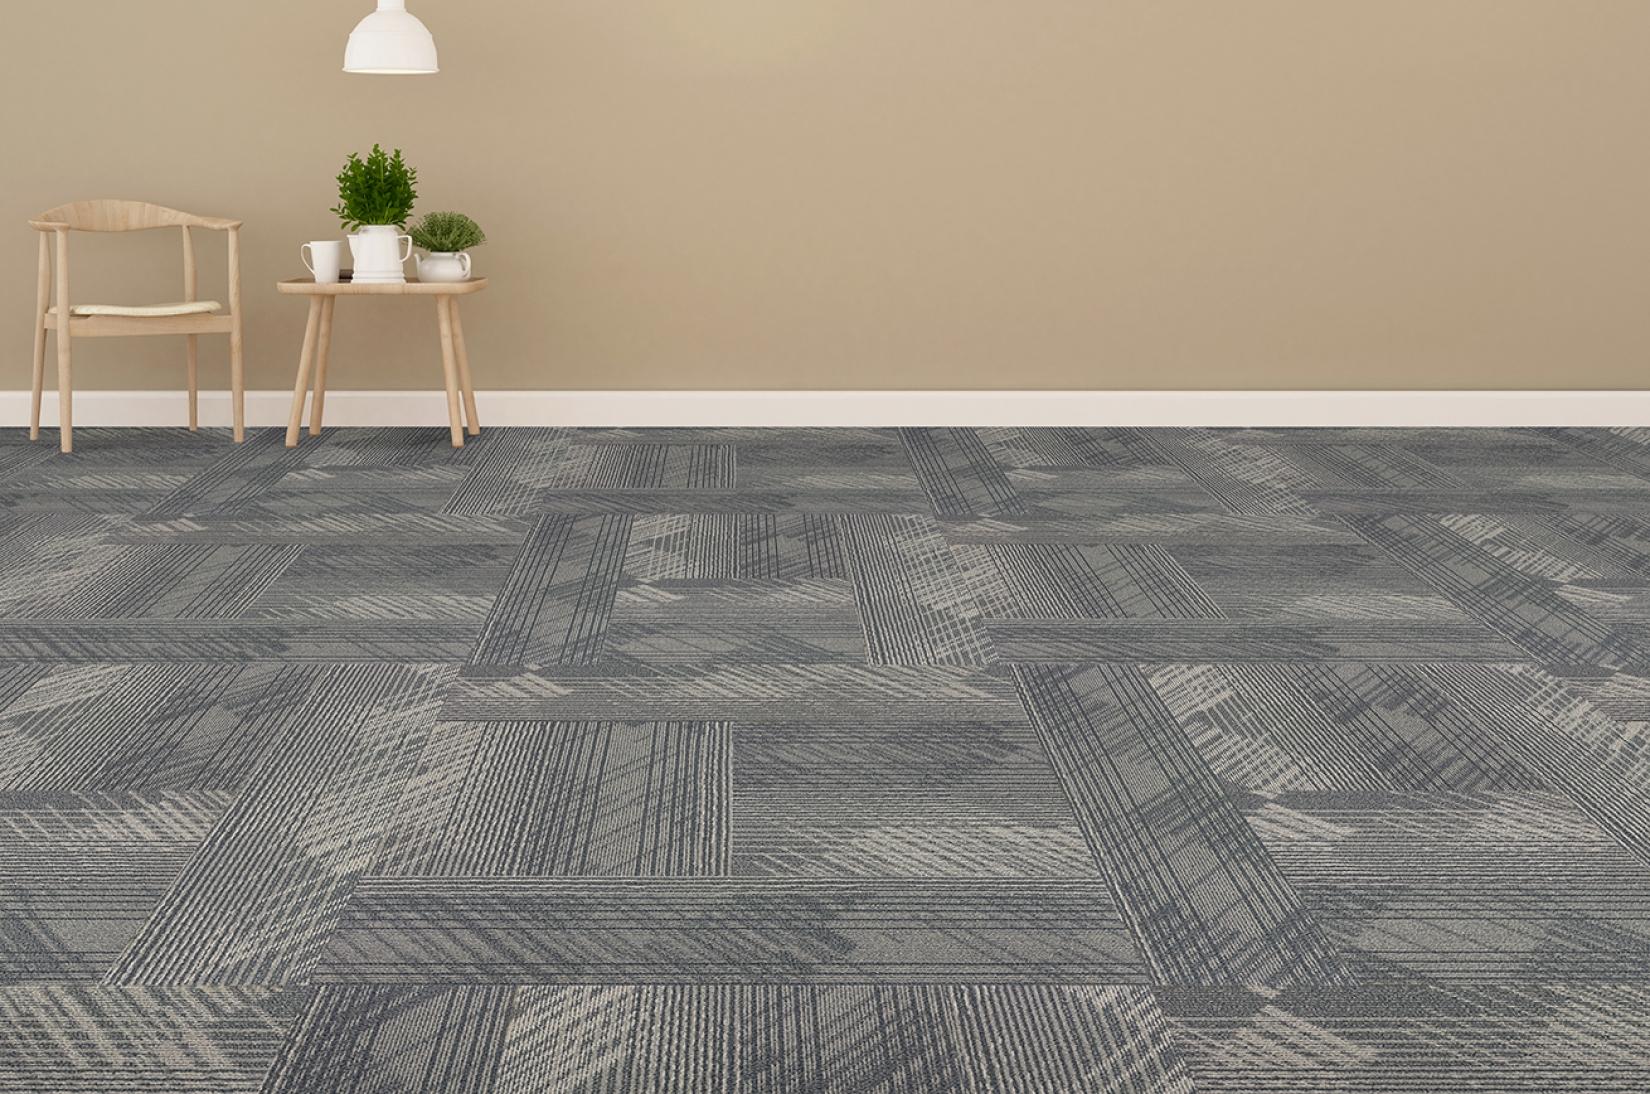 Sketch Carpet Planks and Tiles - #500